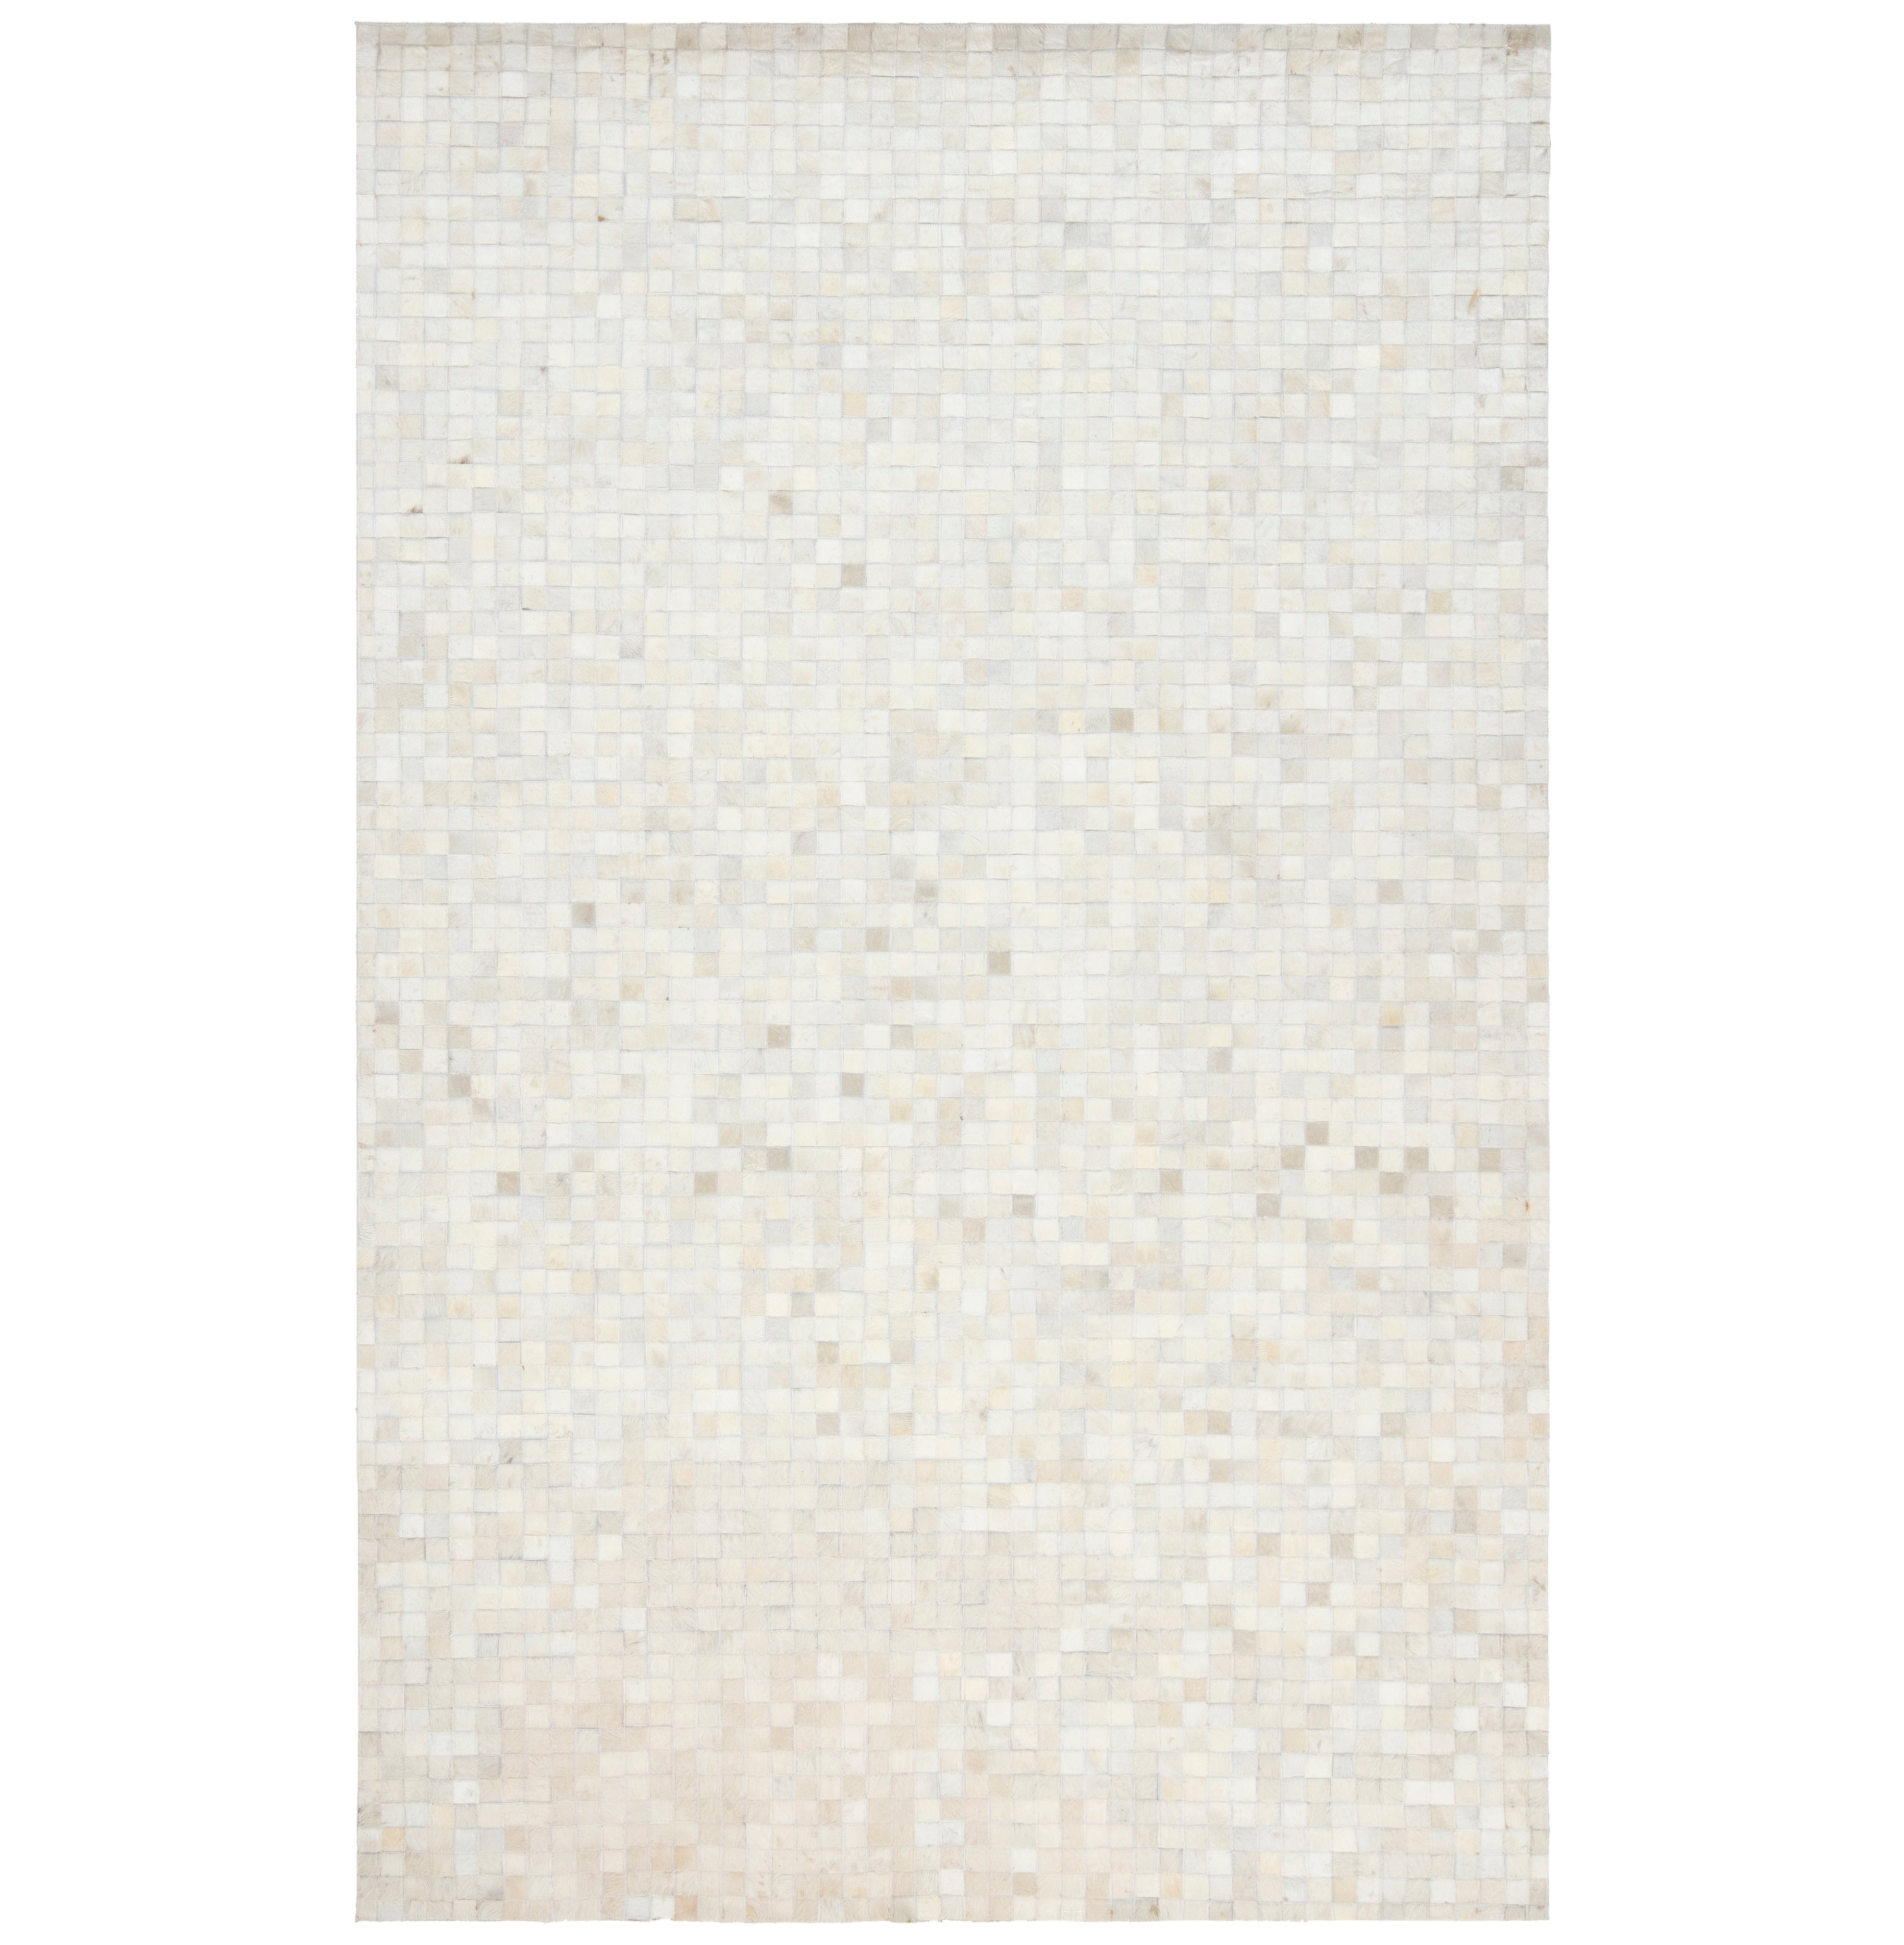 Kochi Global Bazaar Tile Ivory White Cowhide Rug - 2x3